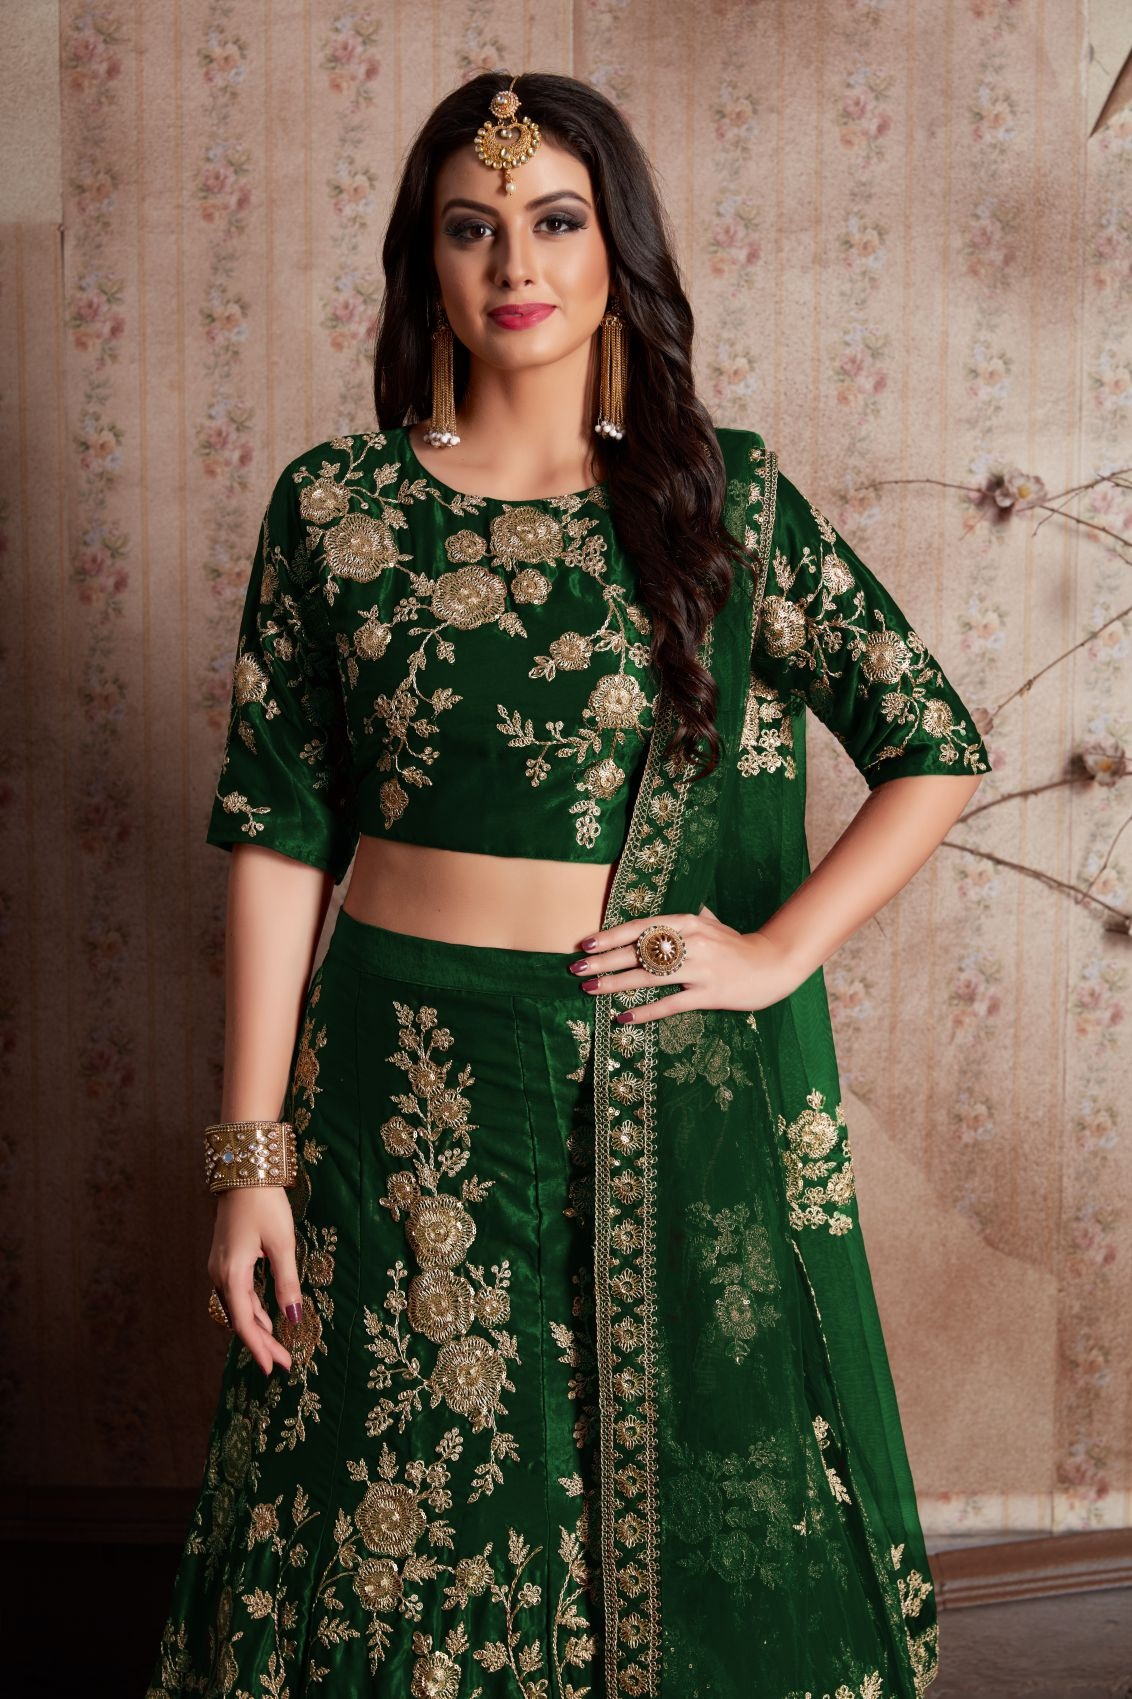 Indian Dress Green Color Bridal Lehenga 359G